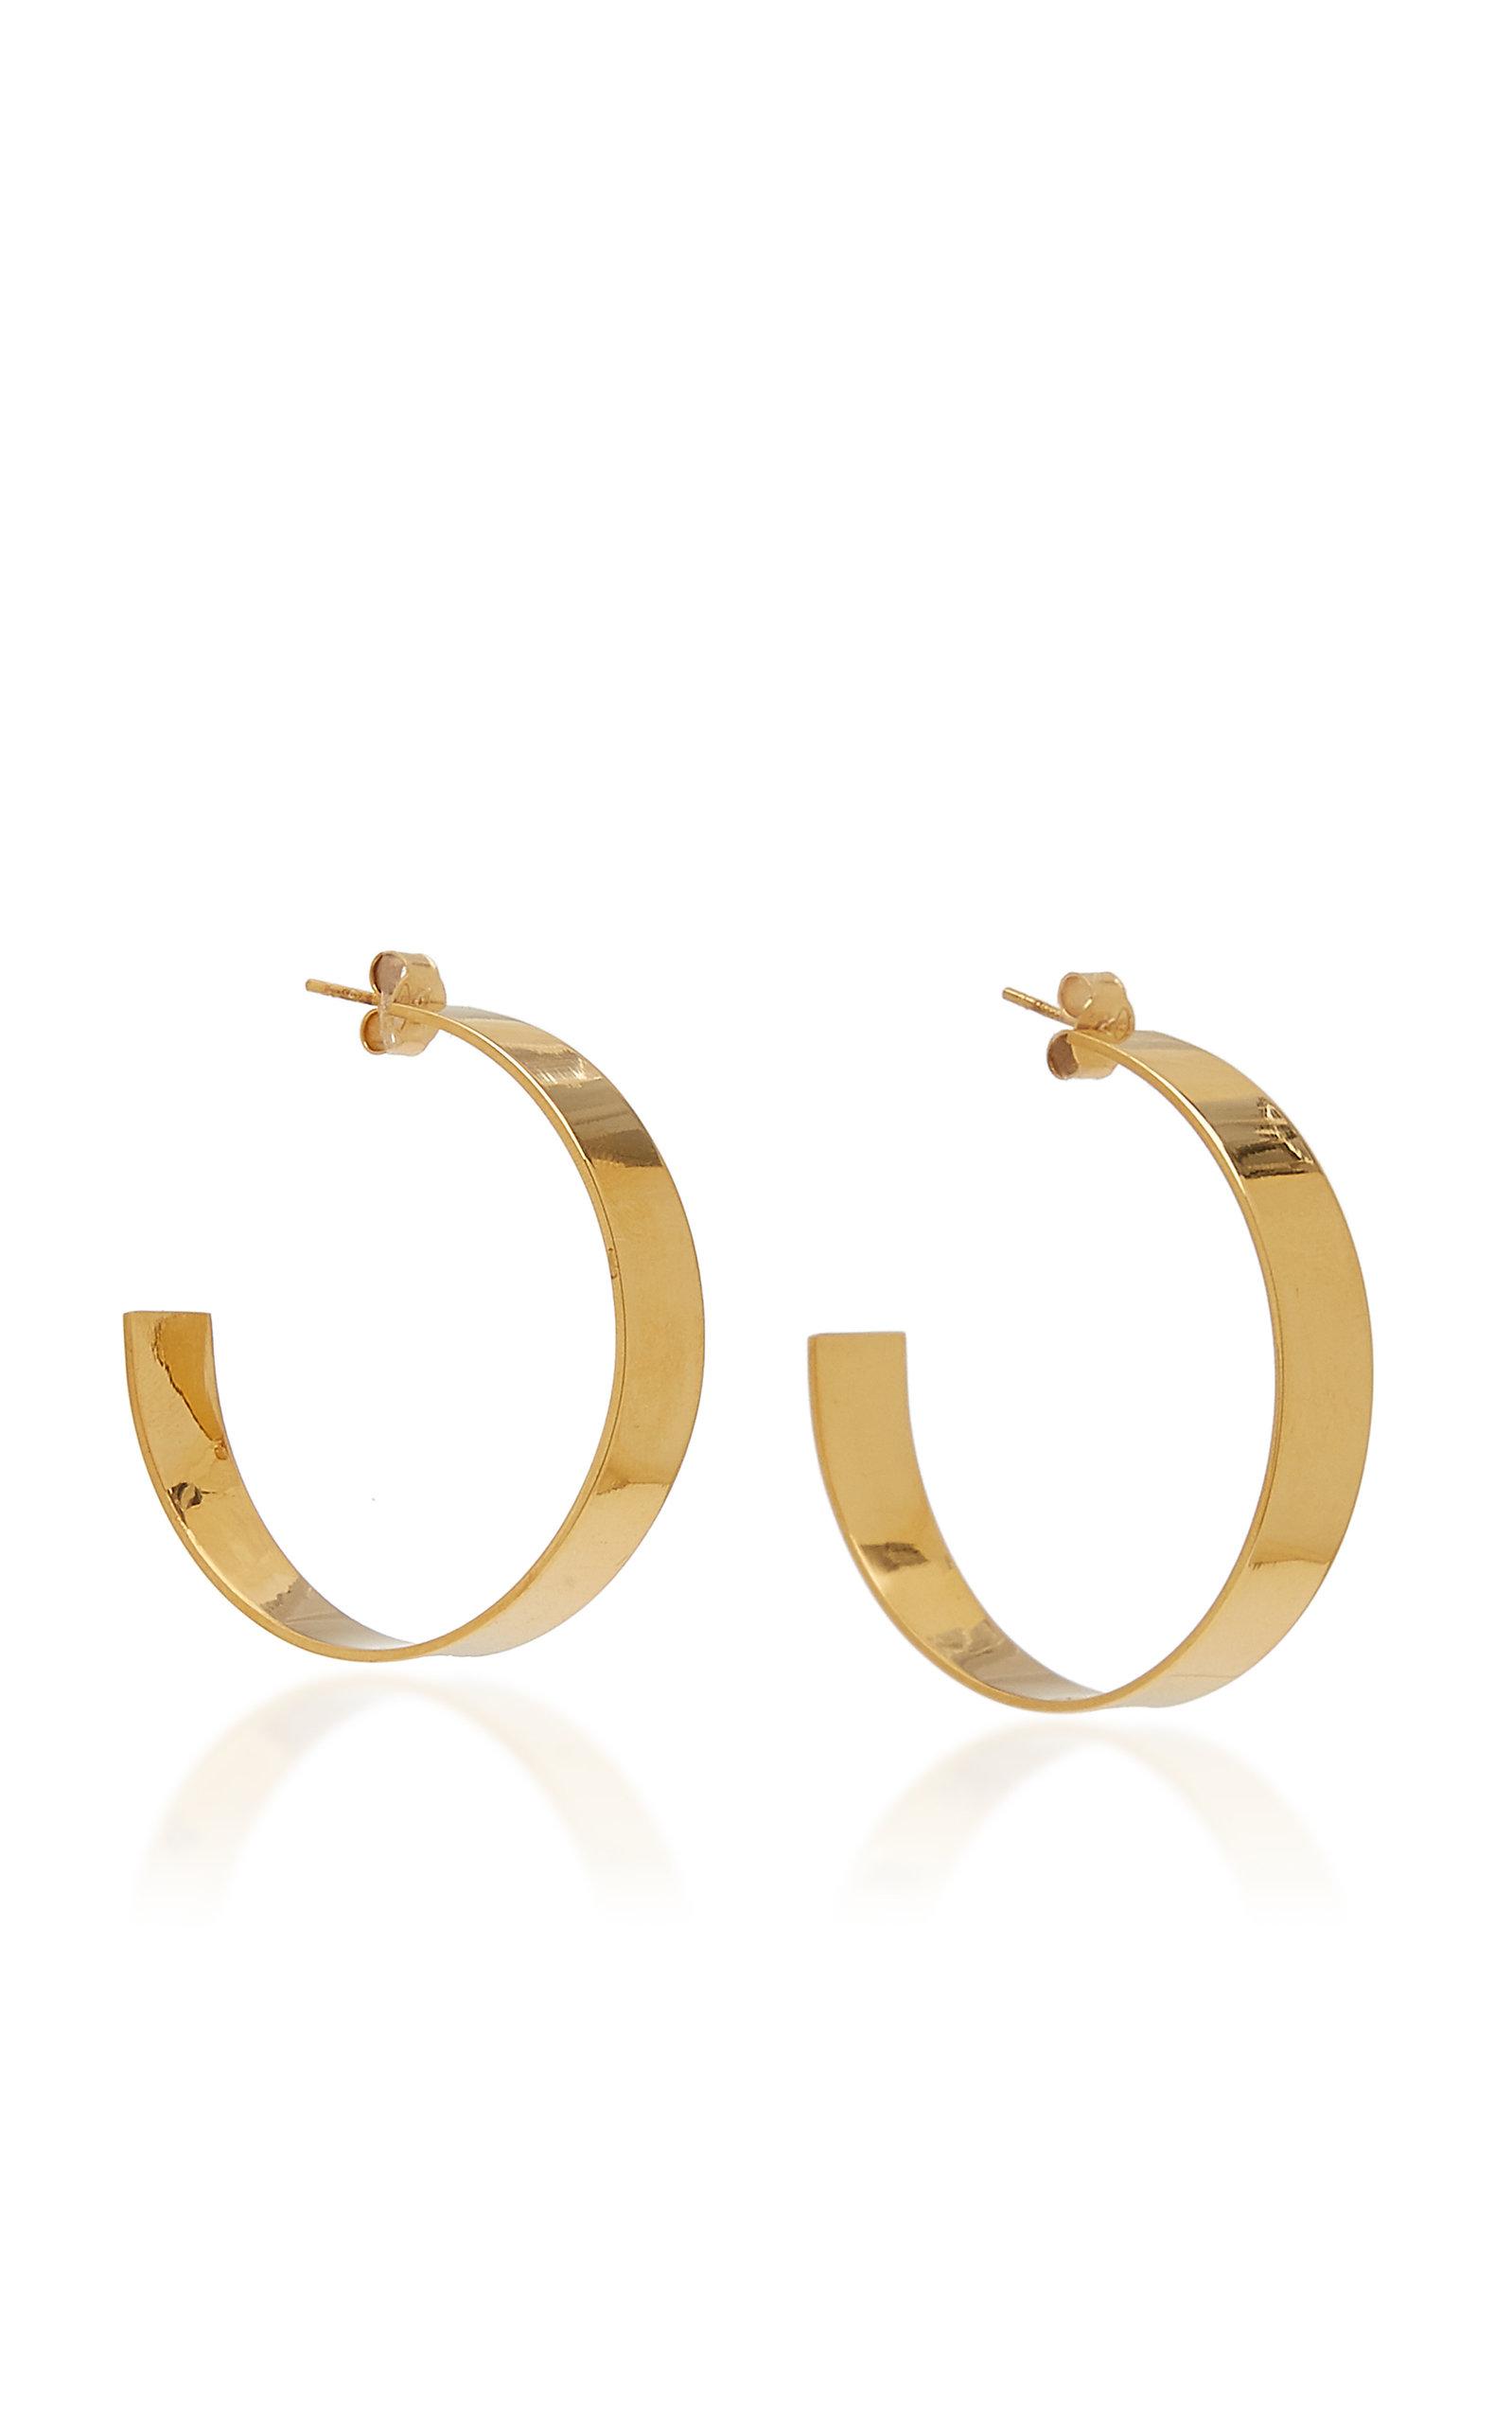 Women's Large Plain Gold-Plated Hoop Earrings